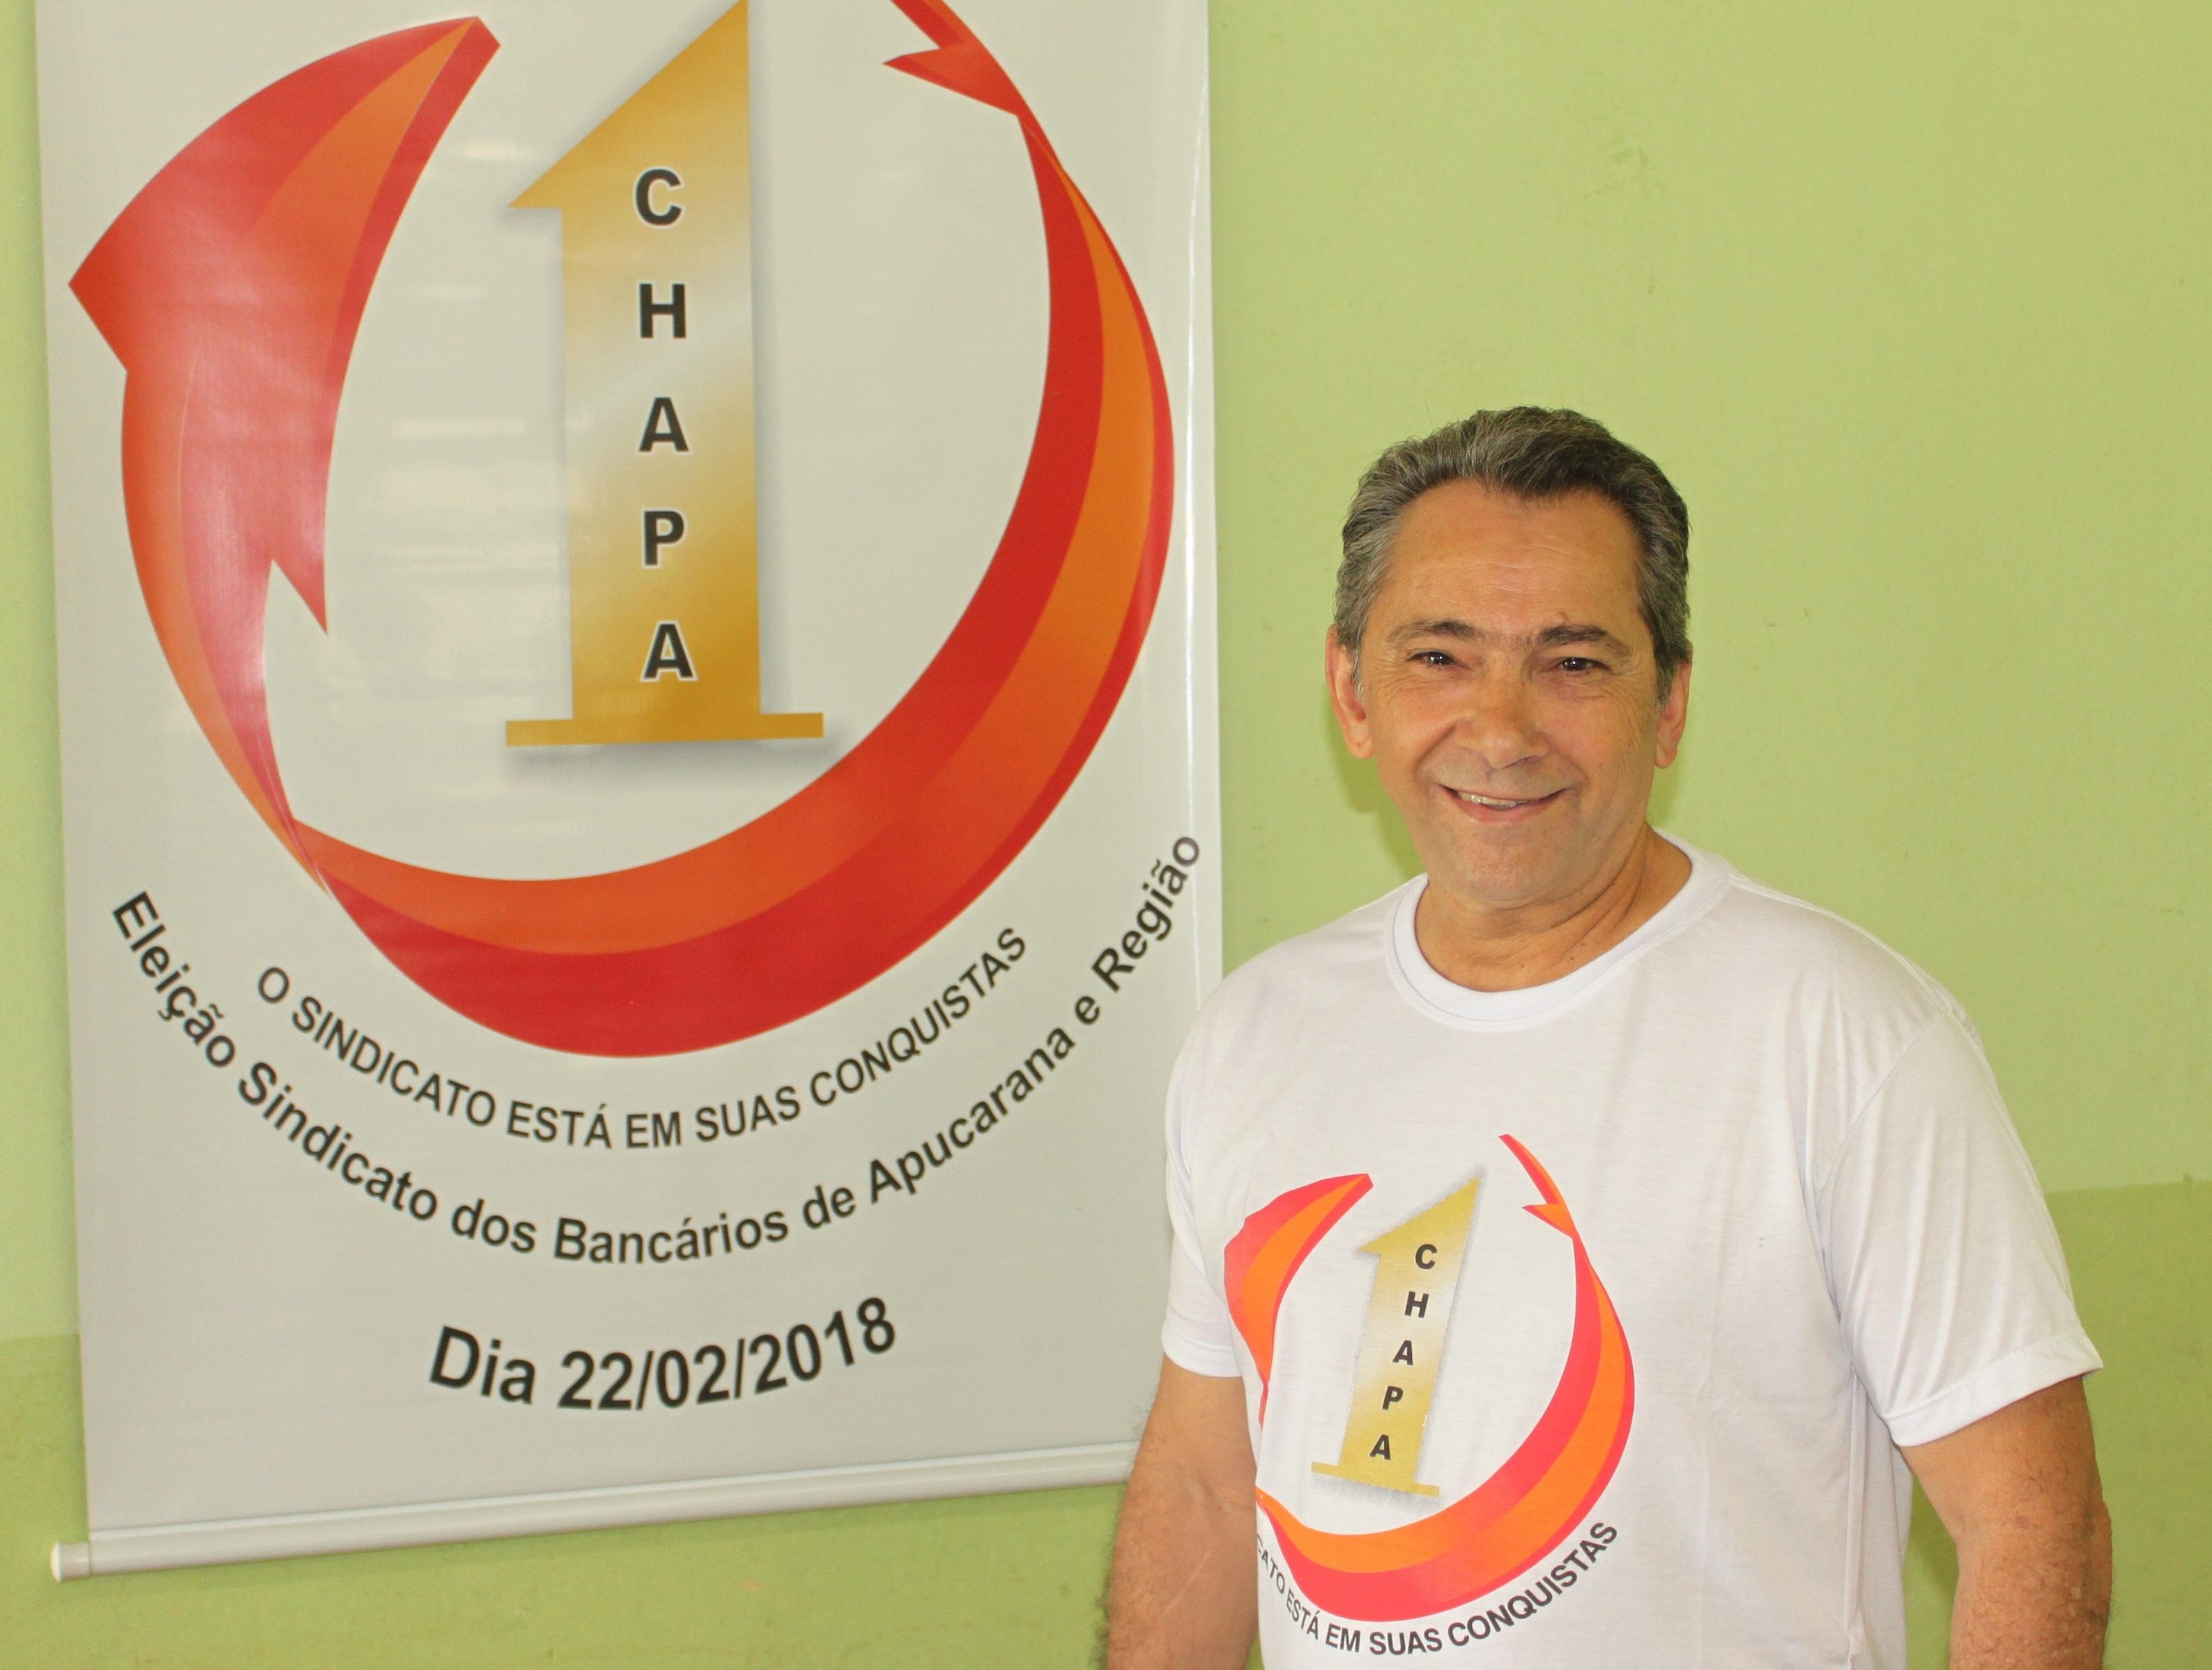 Hermes Gonçalves - Sec. Geral Itaú Apucarana